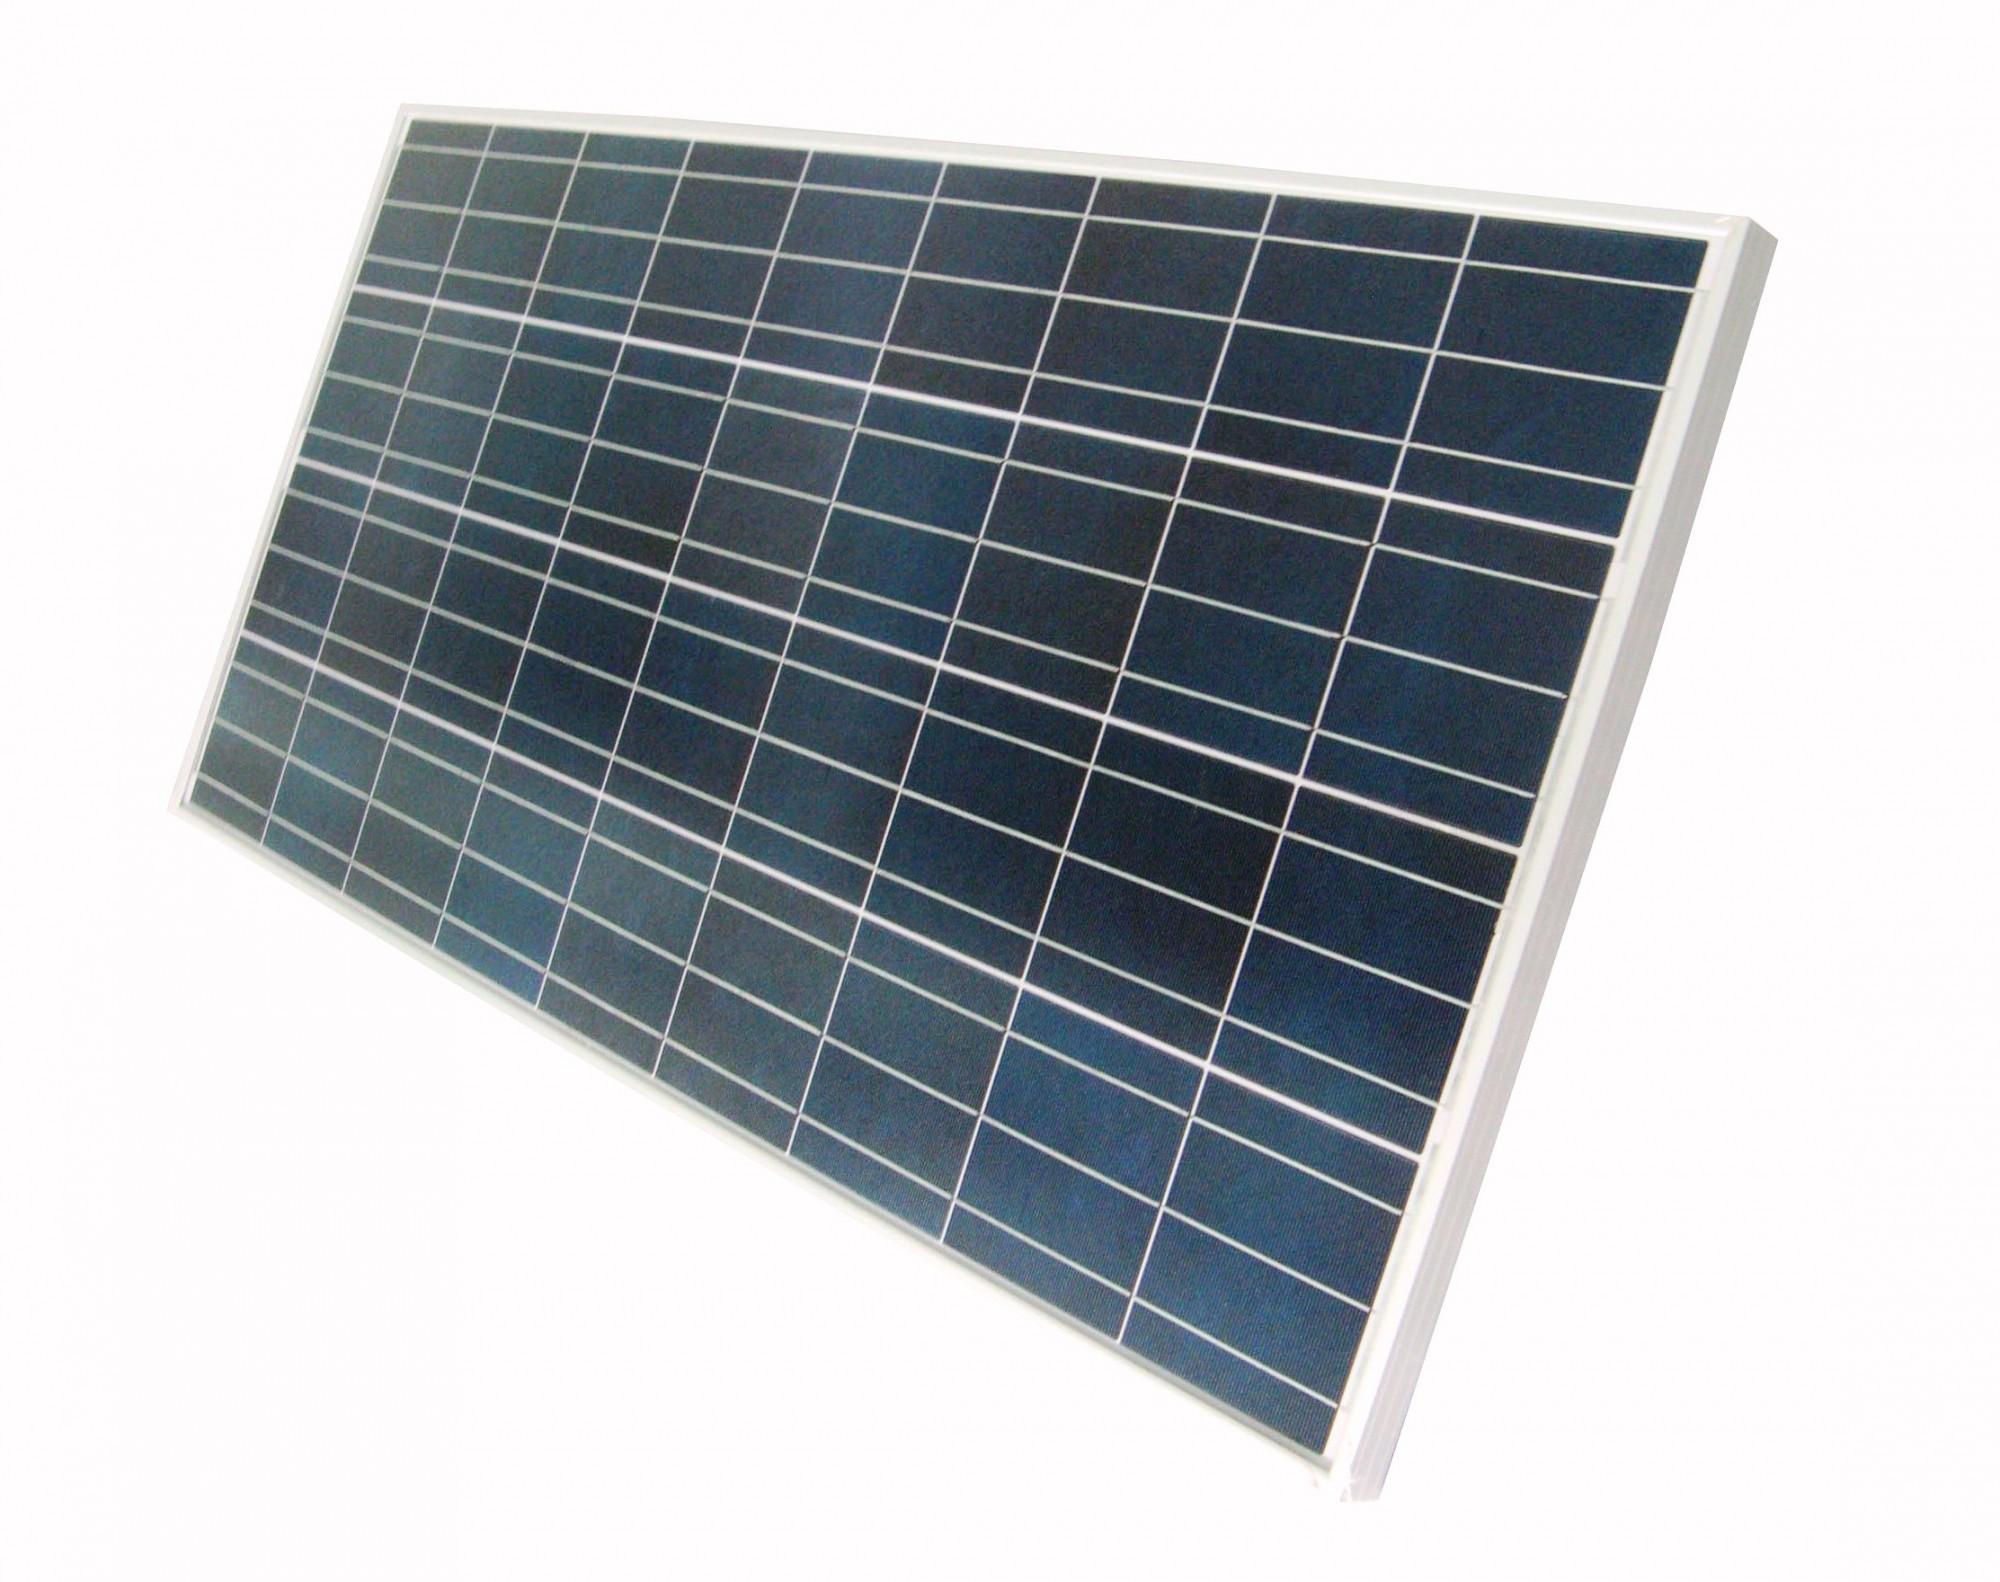 Solarpanel preise